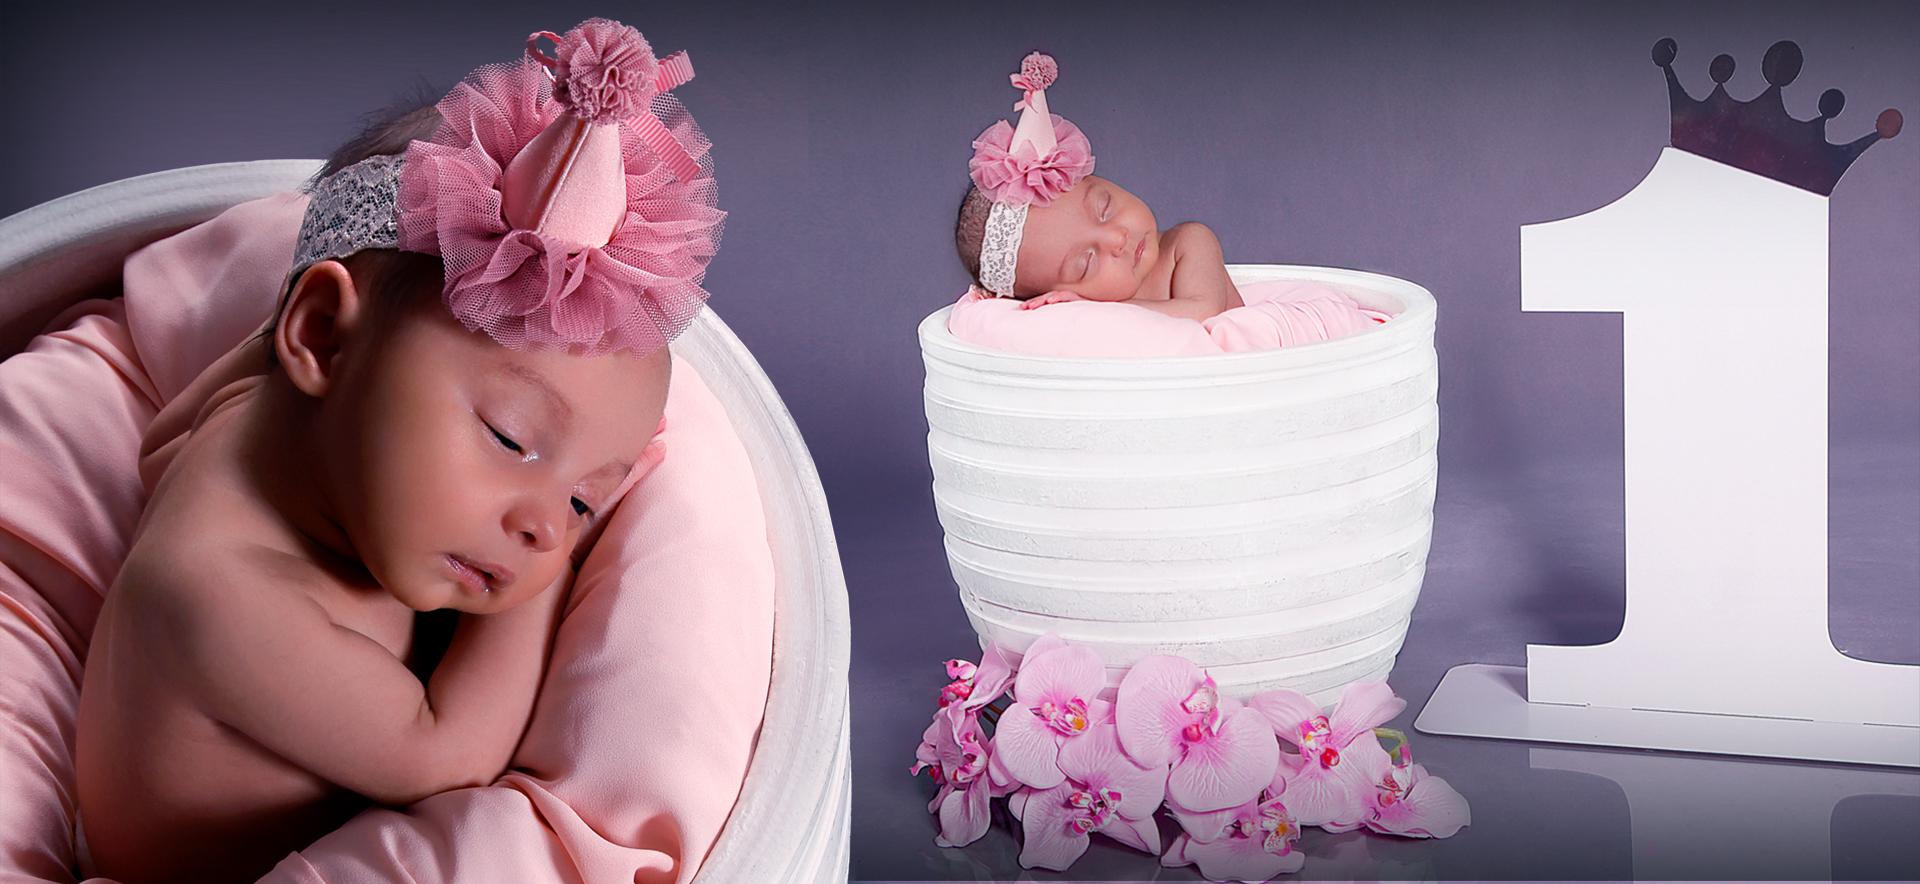 آتلیه نوزاد 2